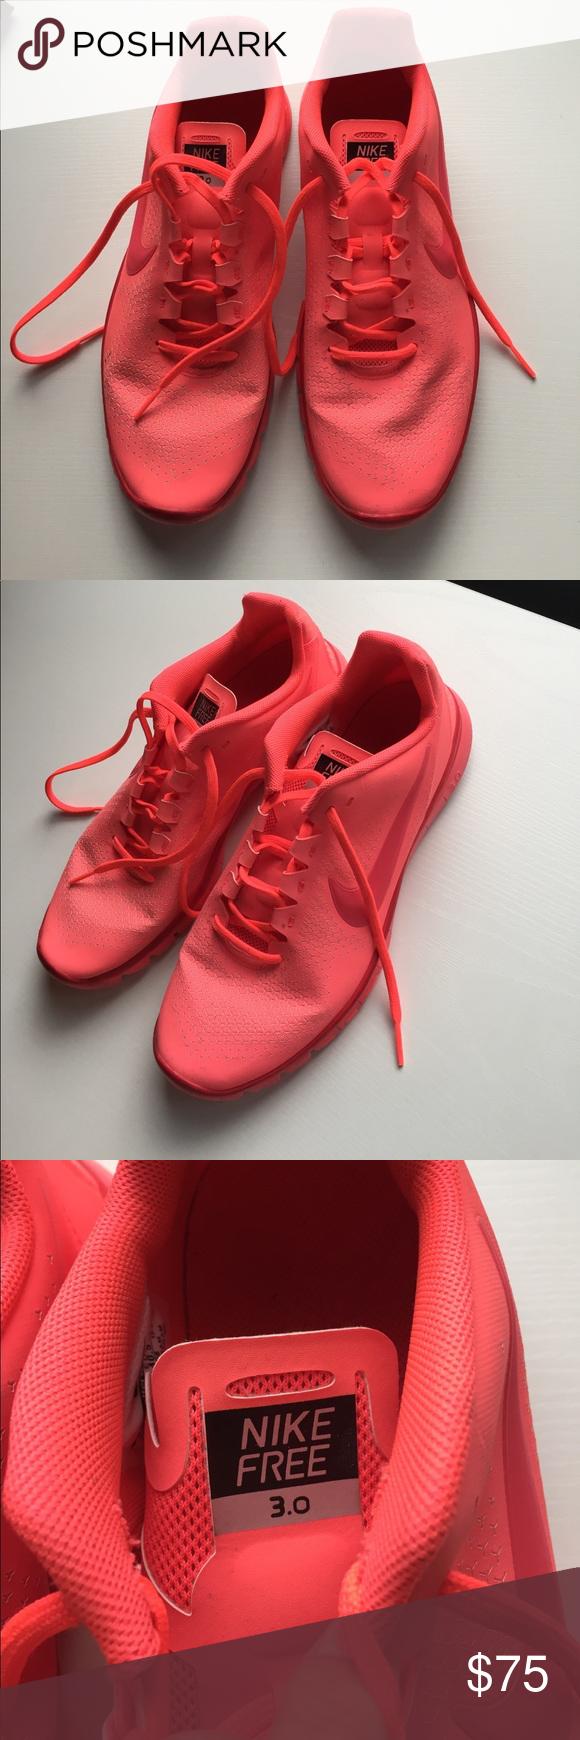 Nike Free Run 3 Hot Punch Amazon Nike Free 3 V4 Hot Punch